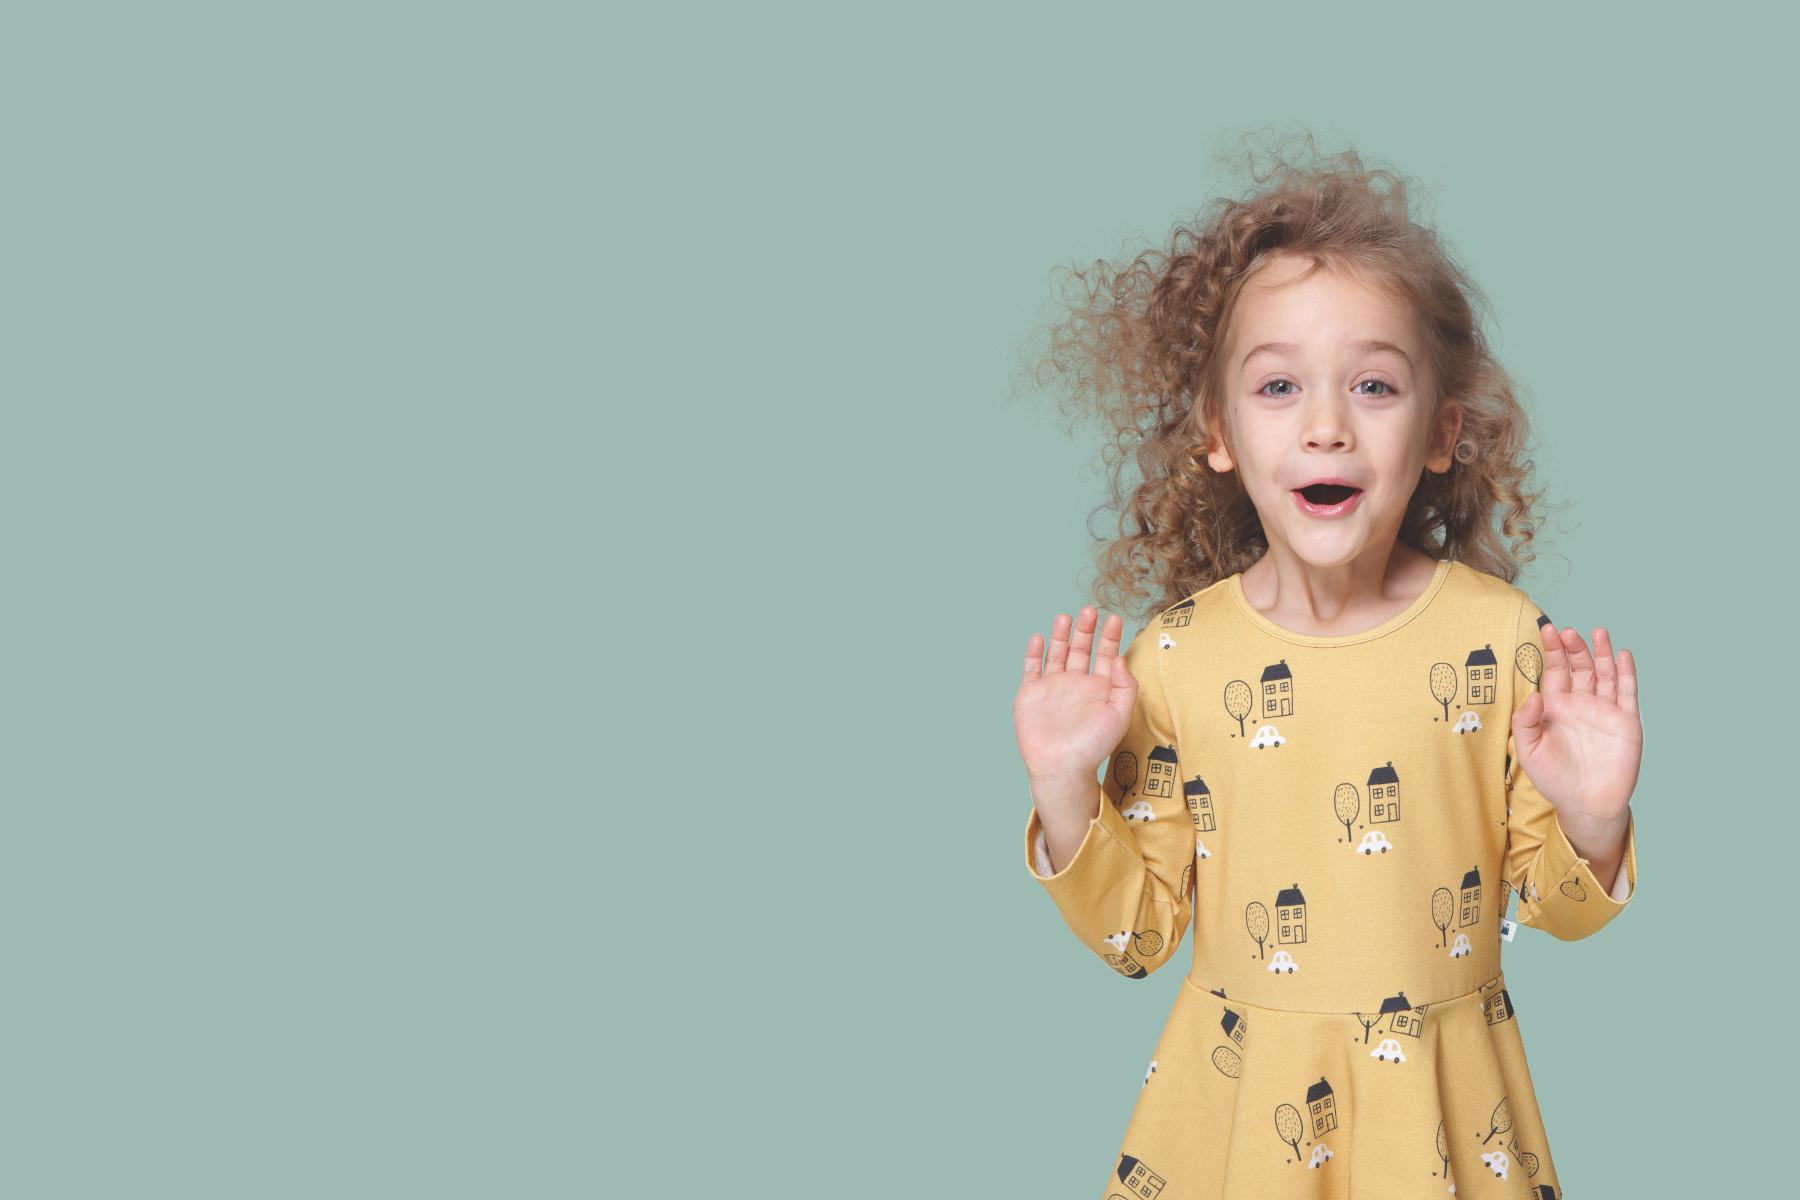 kidswear-designer-cornwall-england